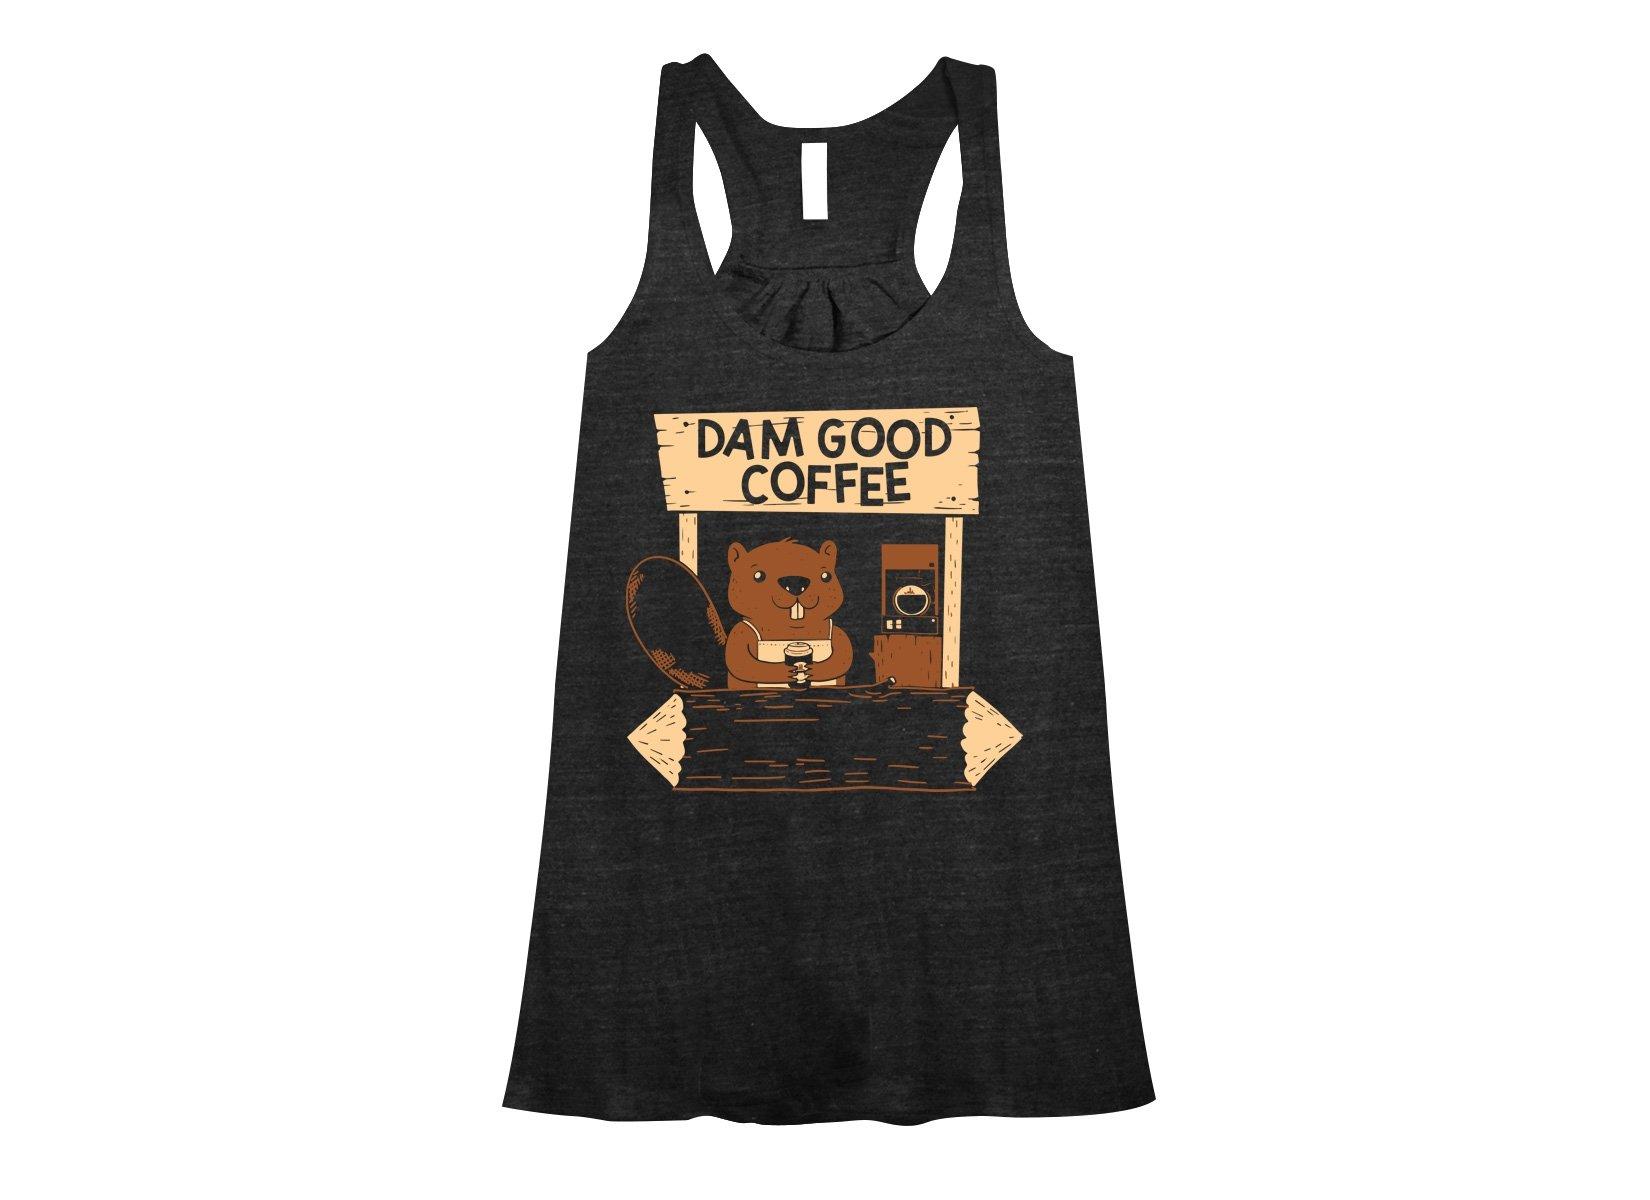 Dam Good Coffee on Womens Tanks T-Shirt